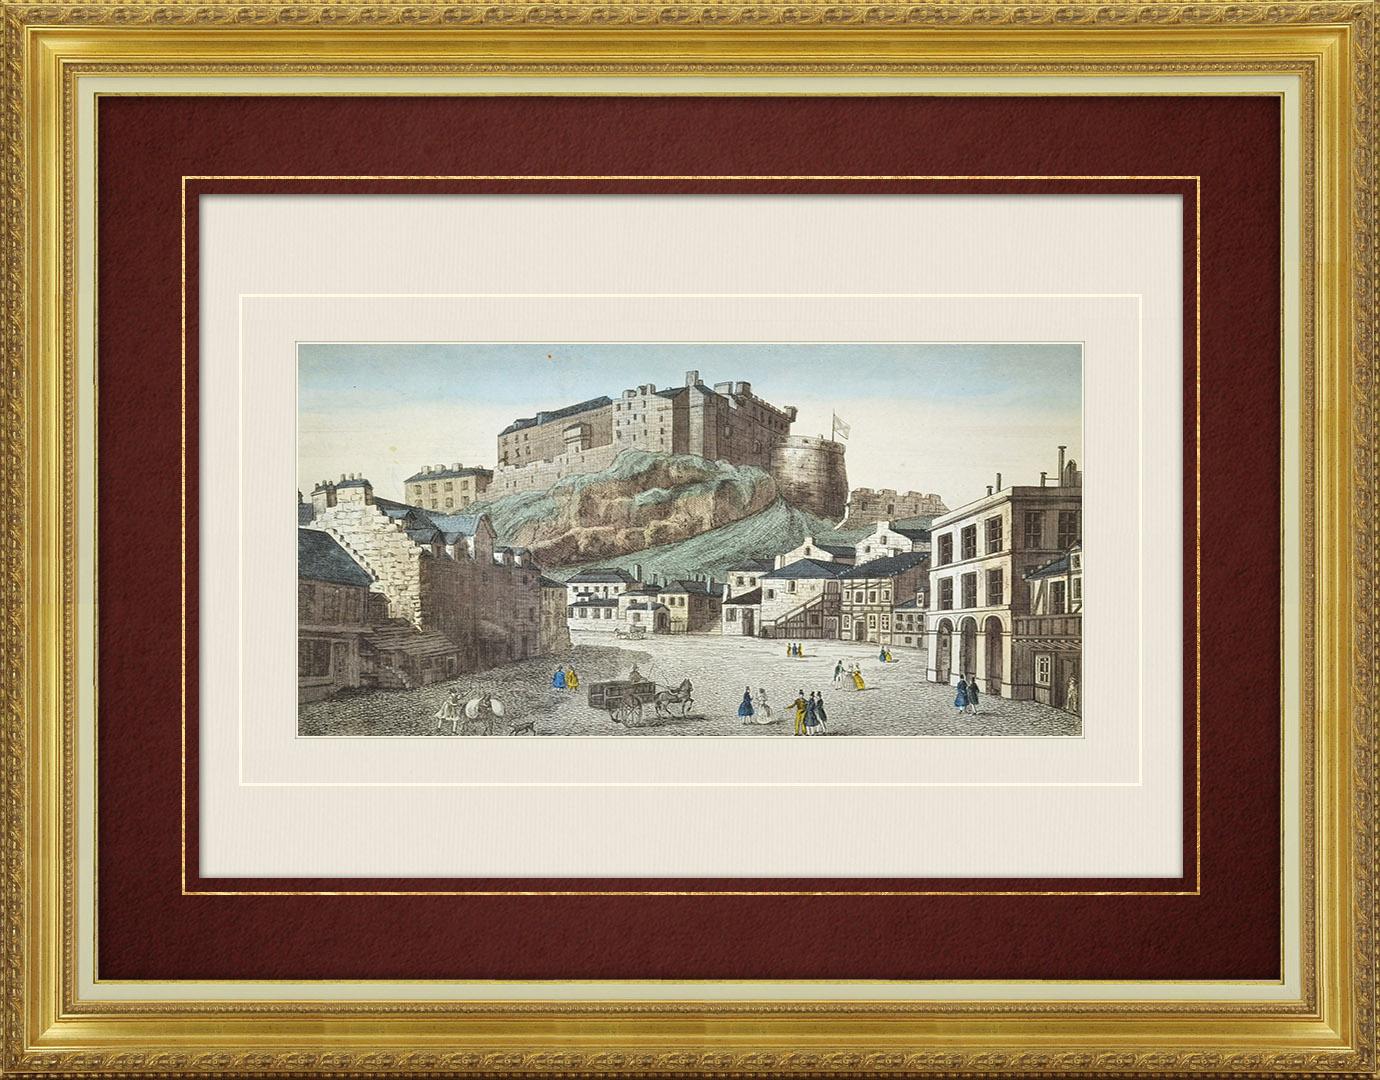 19th Century optical view in original watercolors of Edinburgh Castle (Scotland)